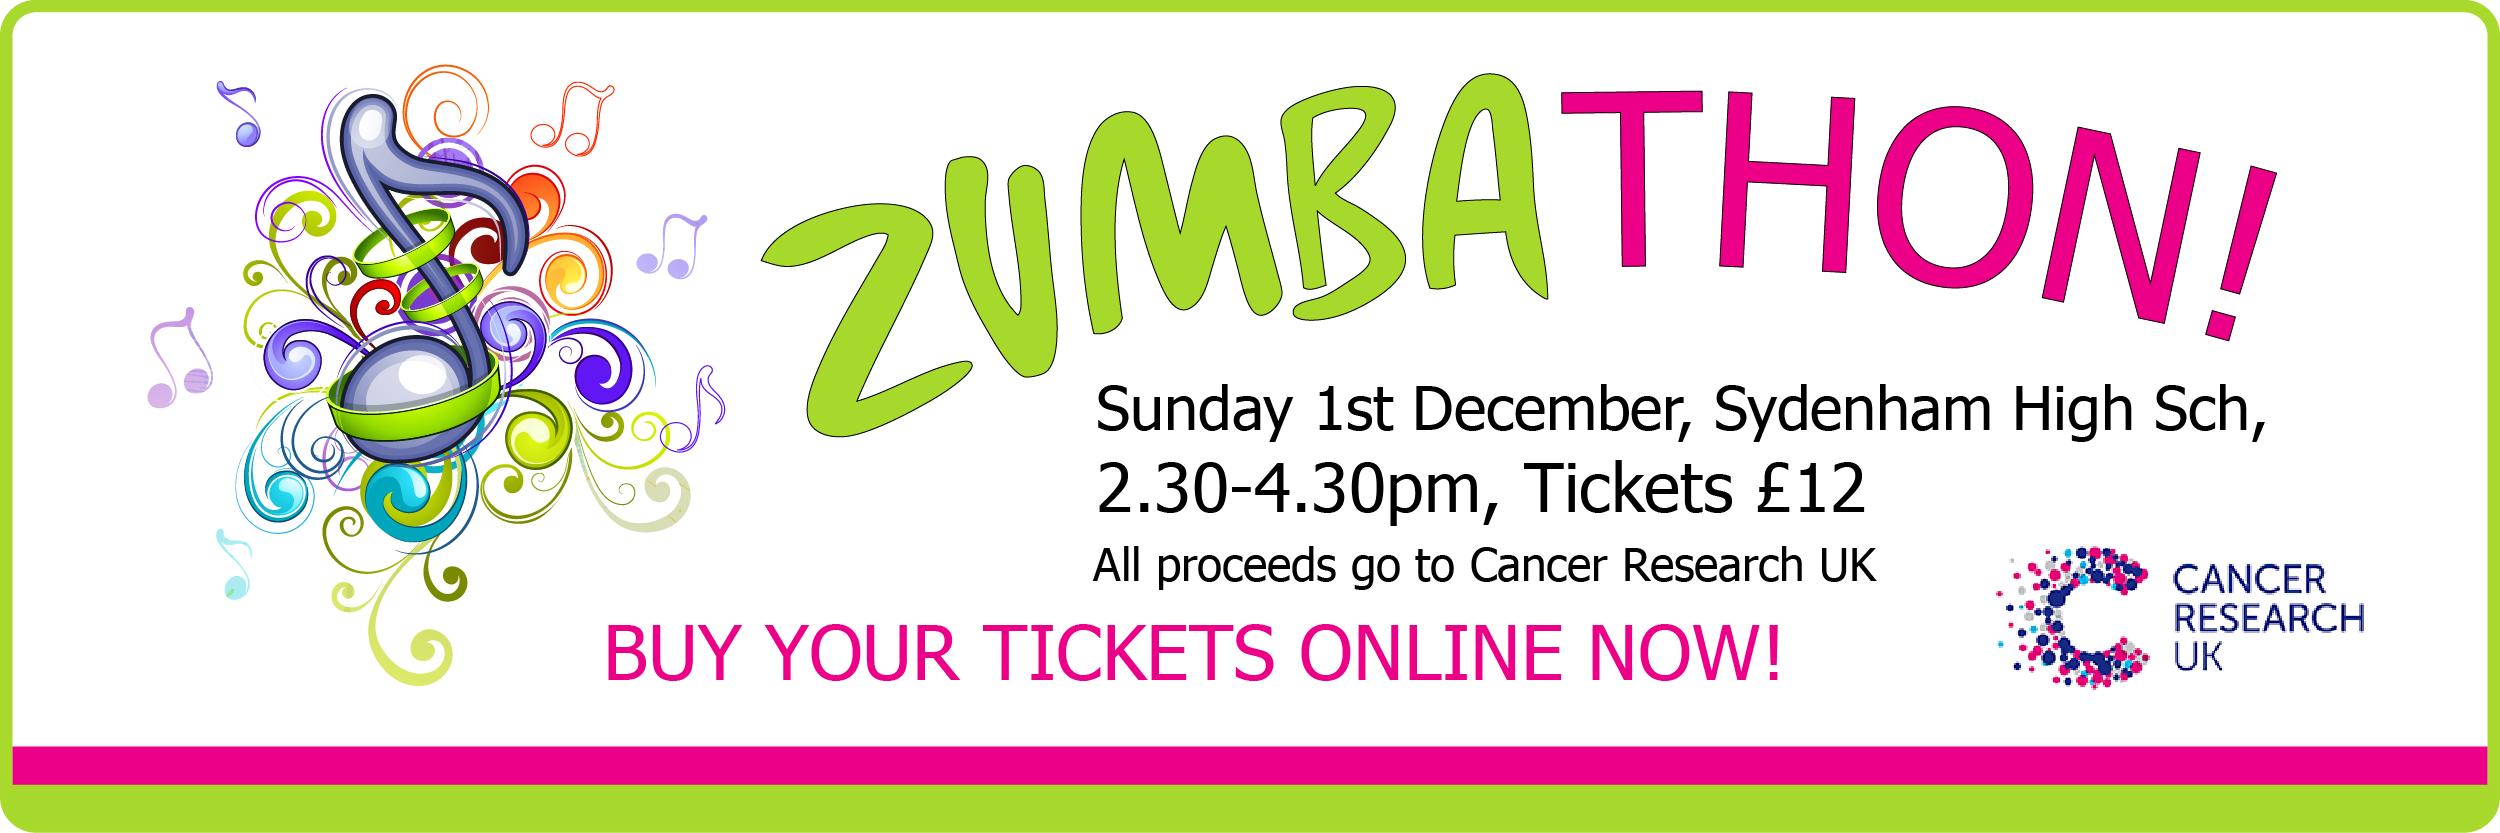 Zumbathon at Sydenham High School, South East London on Sunday 1st December 2013